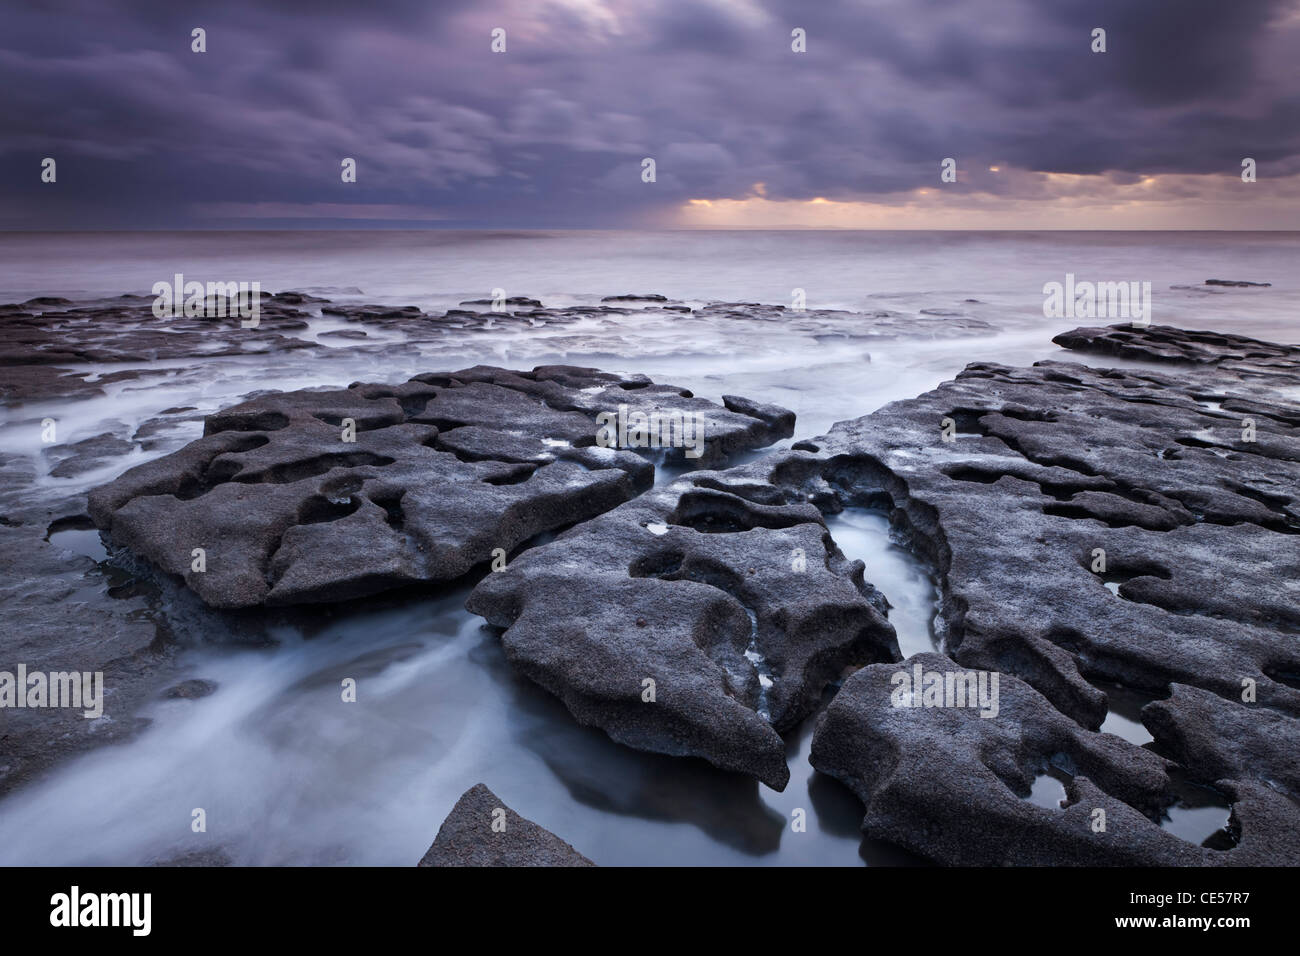 Waves rush around eroded rock ledges at Southerndown on the Glamorgan Heritage Coast, Wales, UK. Winter (December) - Stock Image